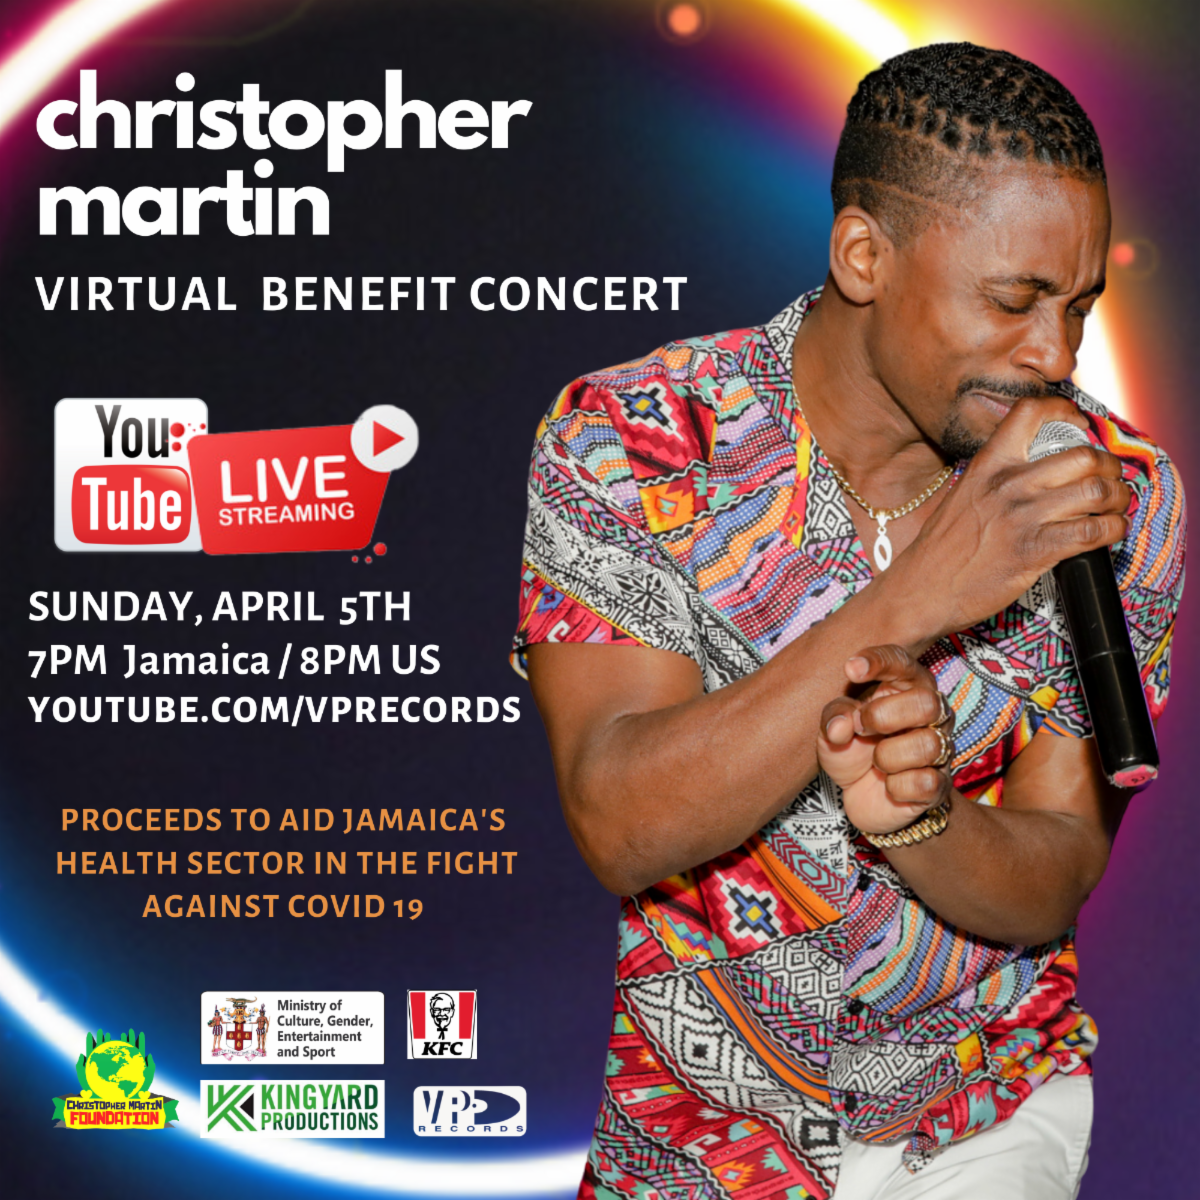 Christopher Martin And Kfc Christmas Album 2020 Christopher Martin Presents Live Stream Performance on VP Records